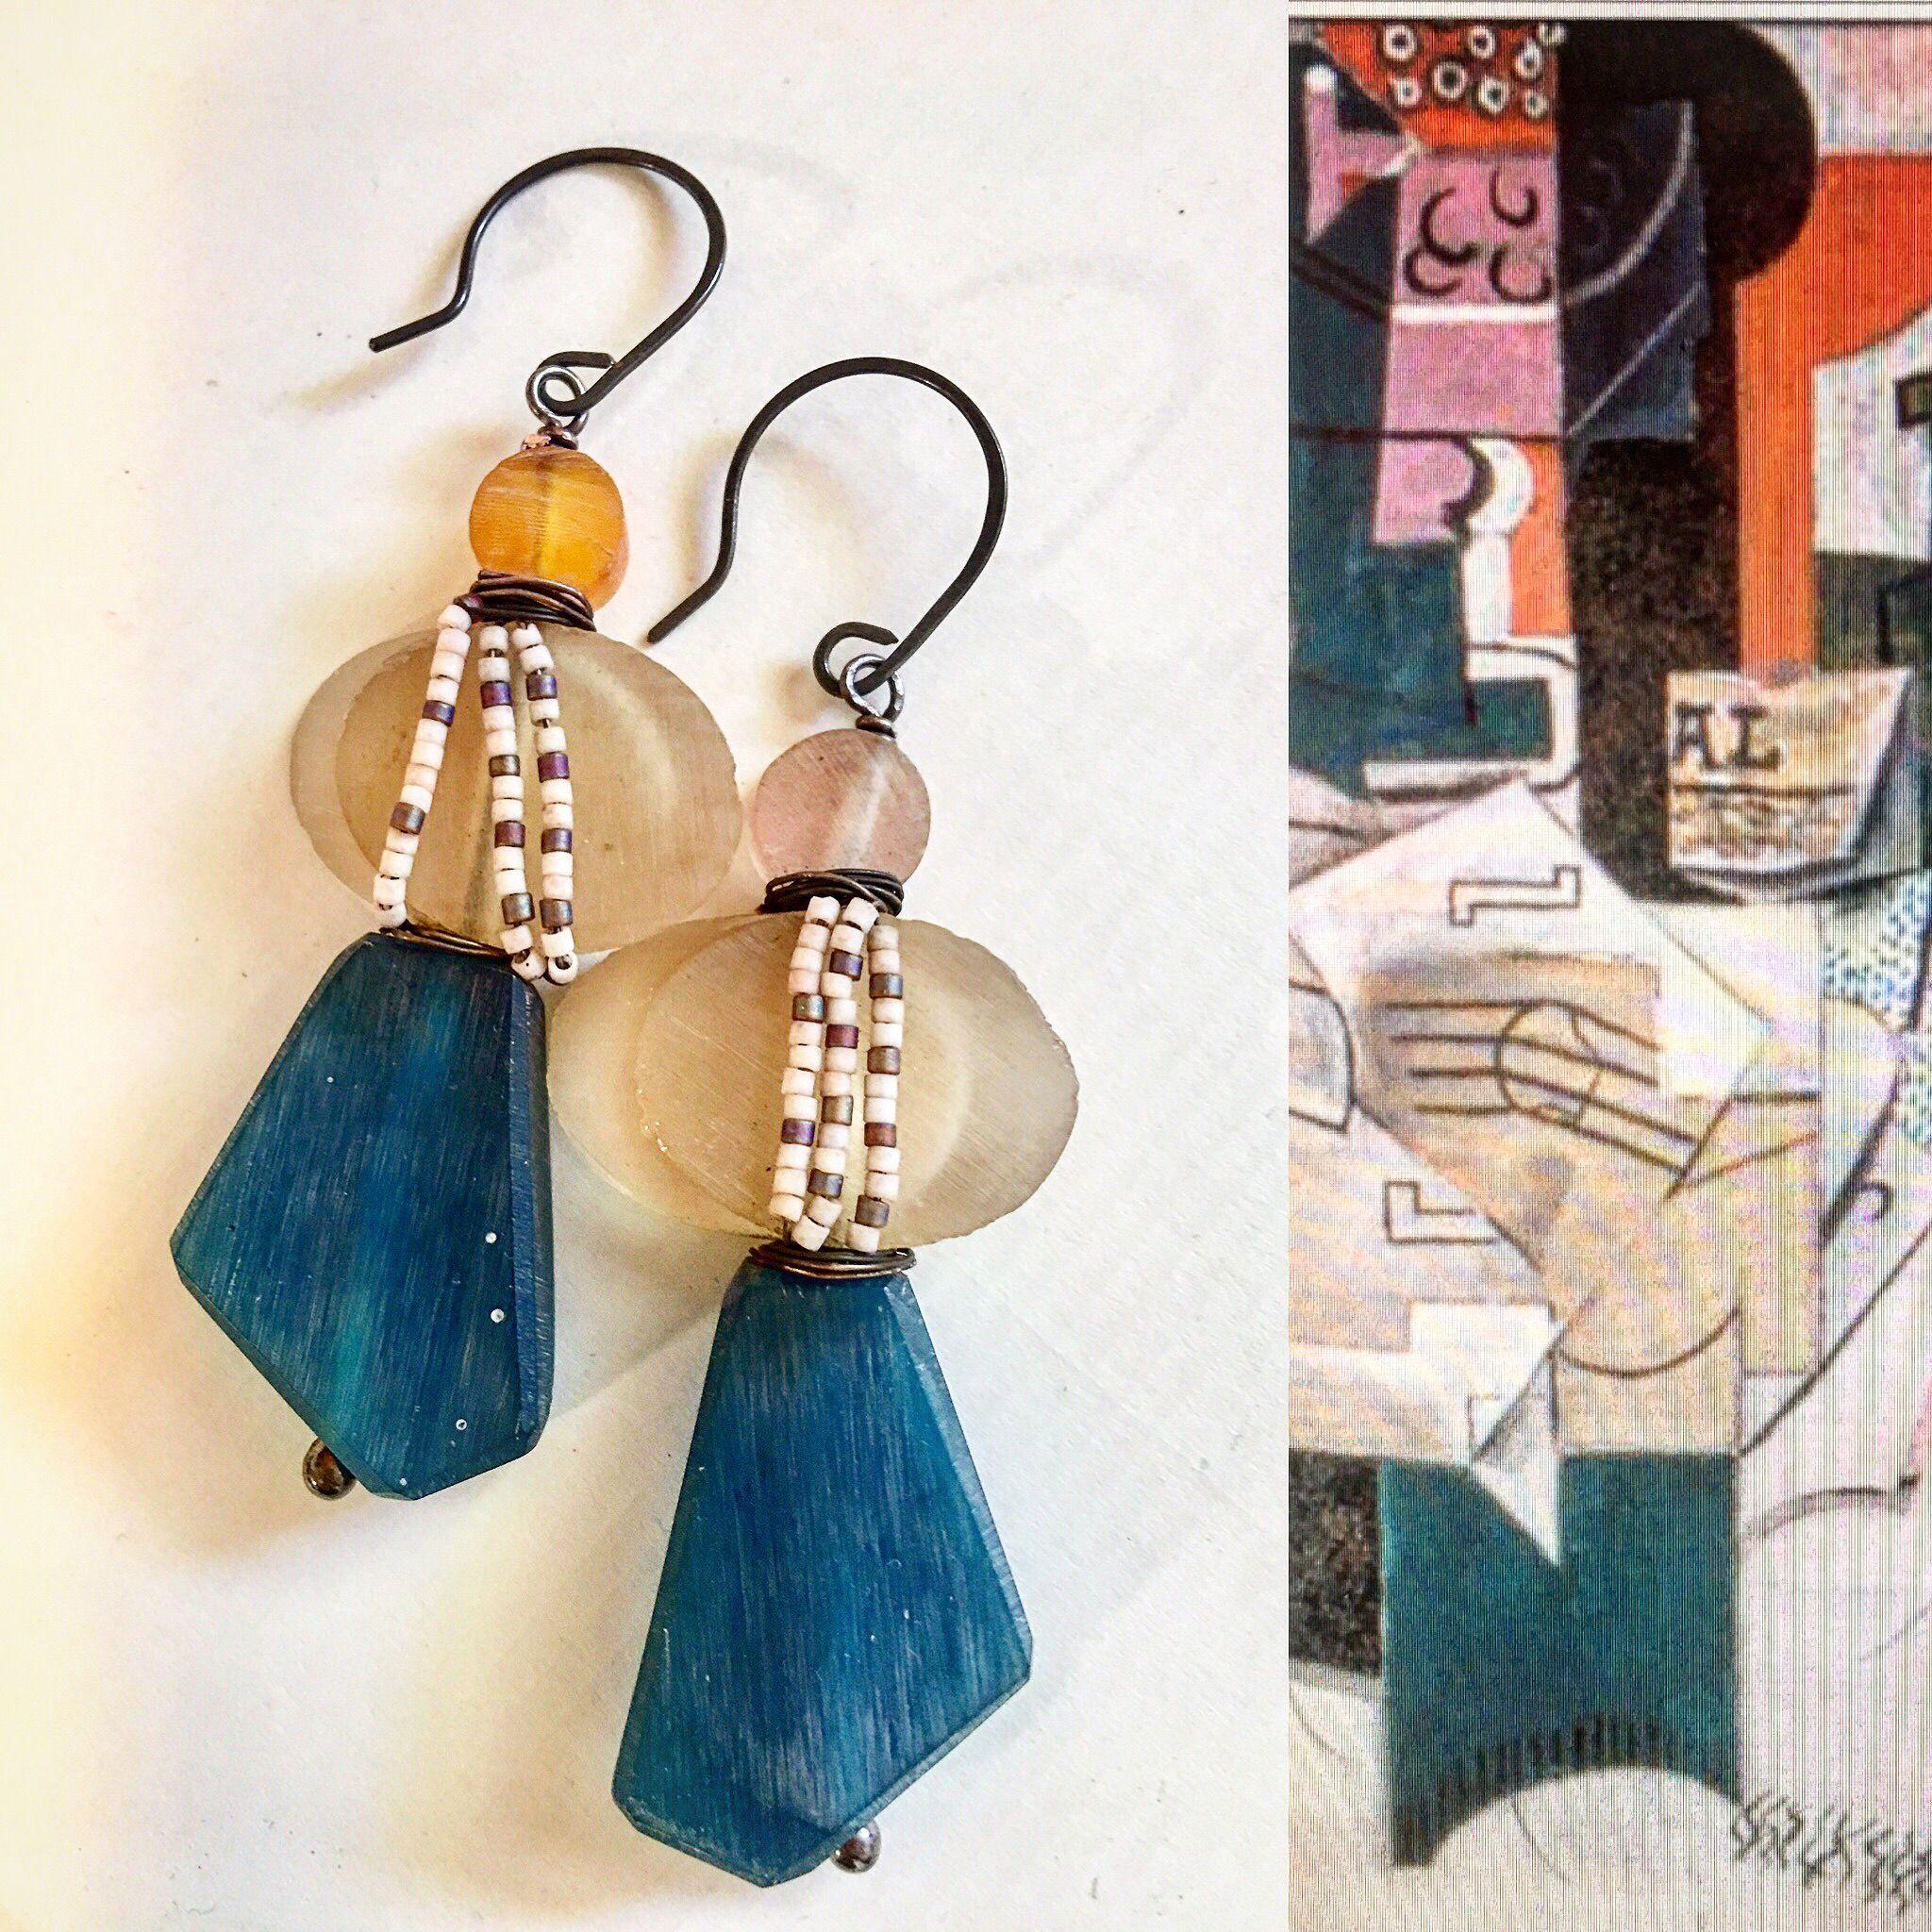 Art Bead Scene May Challenge Www Loraleekolton Etsy Com Handmade Indonesian Resin Beads Headpins And Earw Jewelry Inspiration